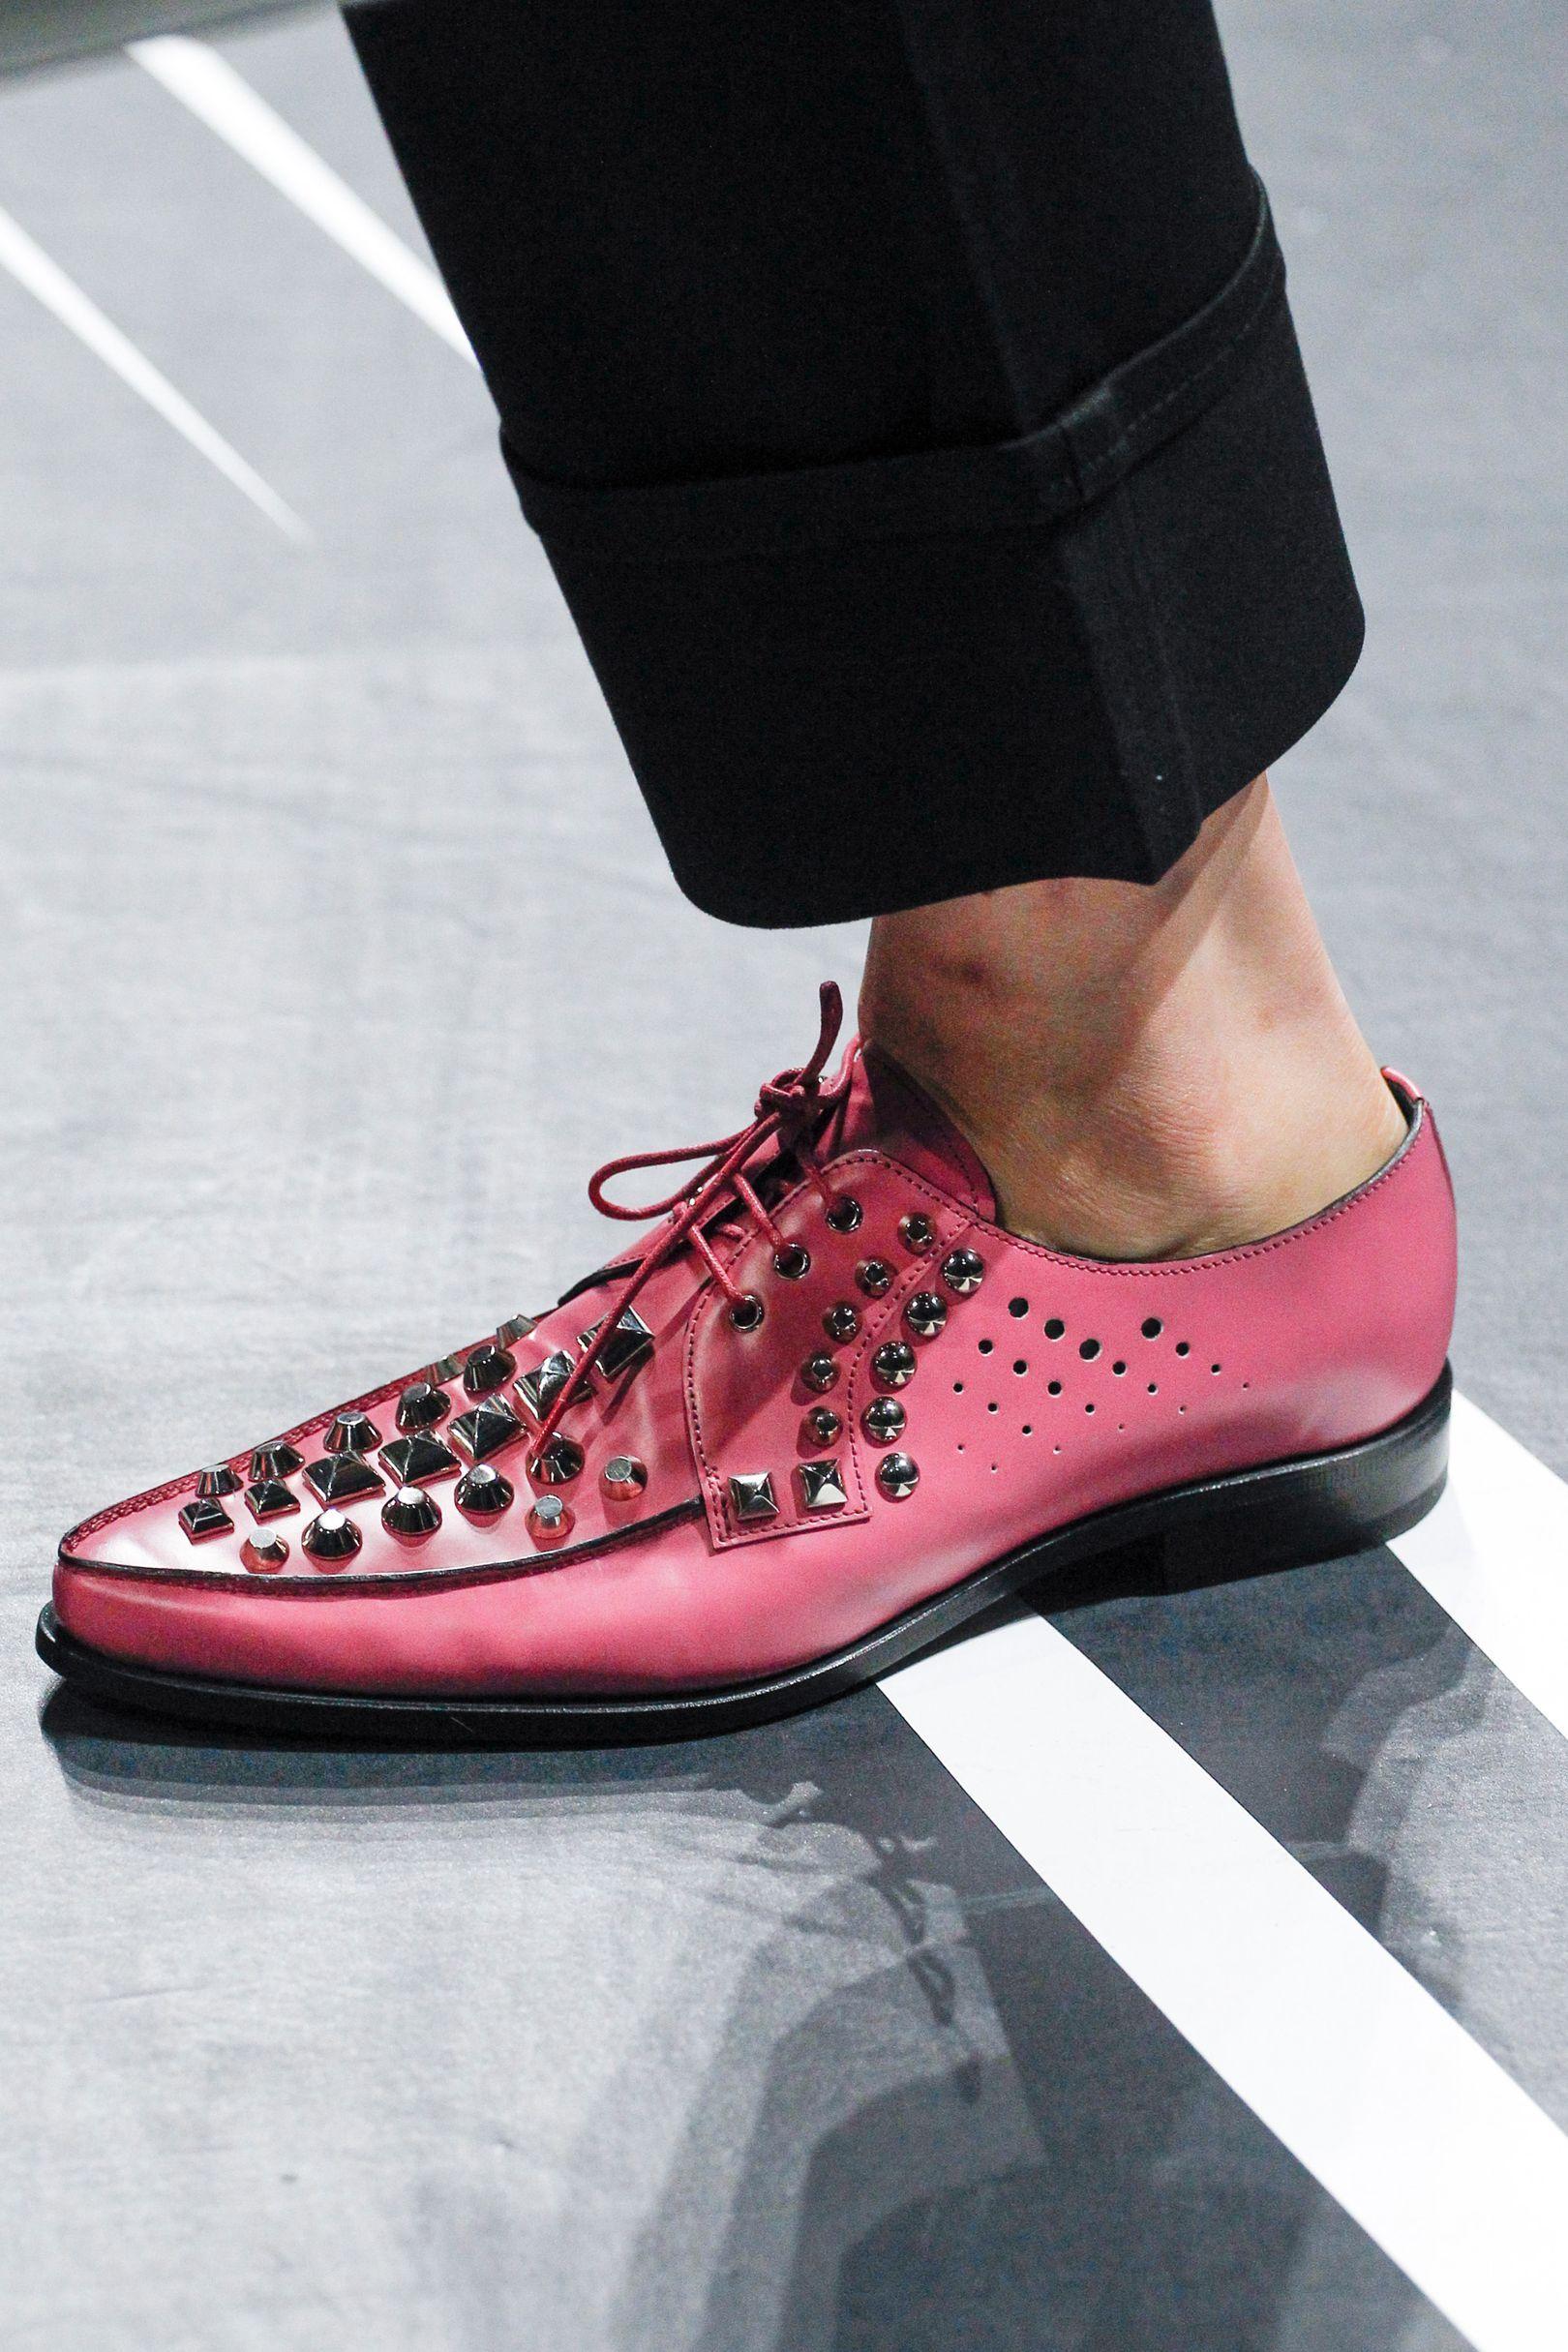 prada shoes 2016 summer movies